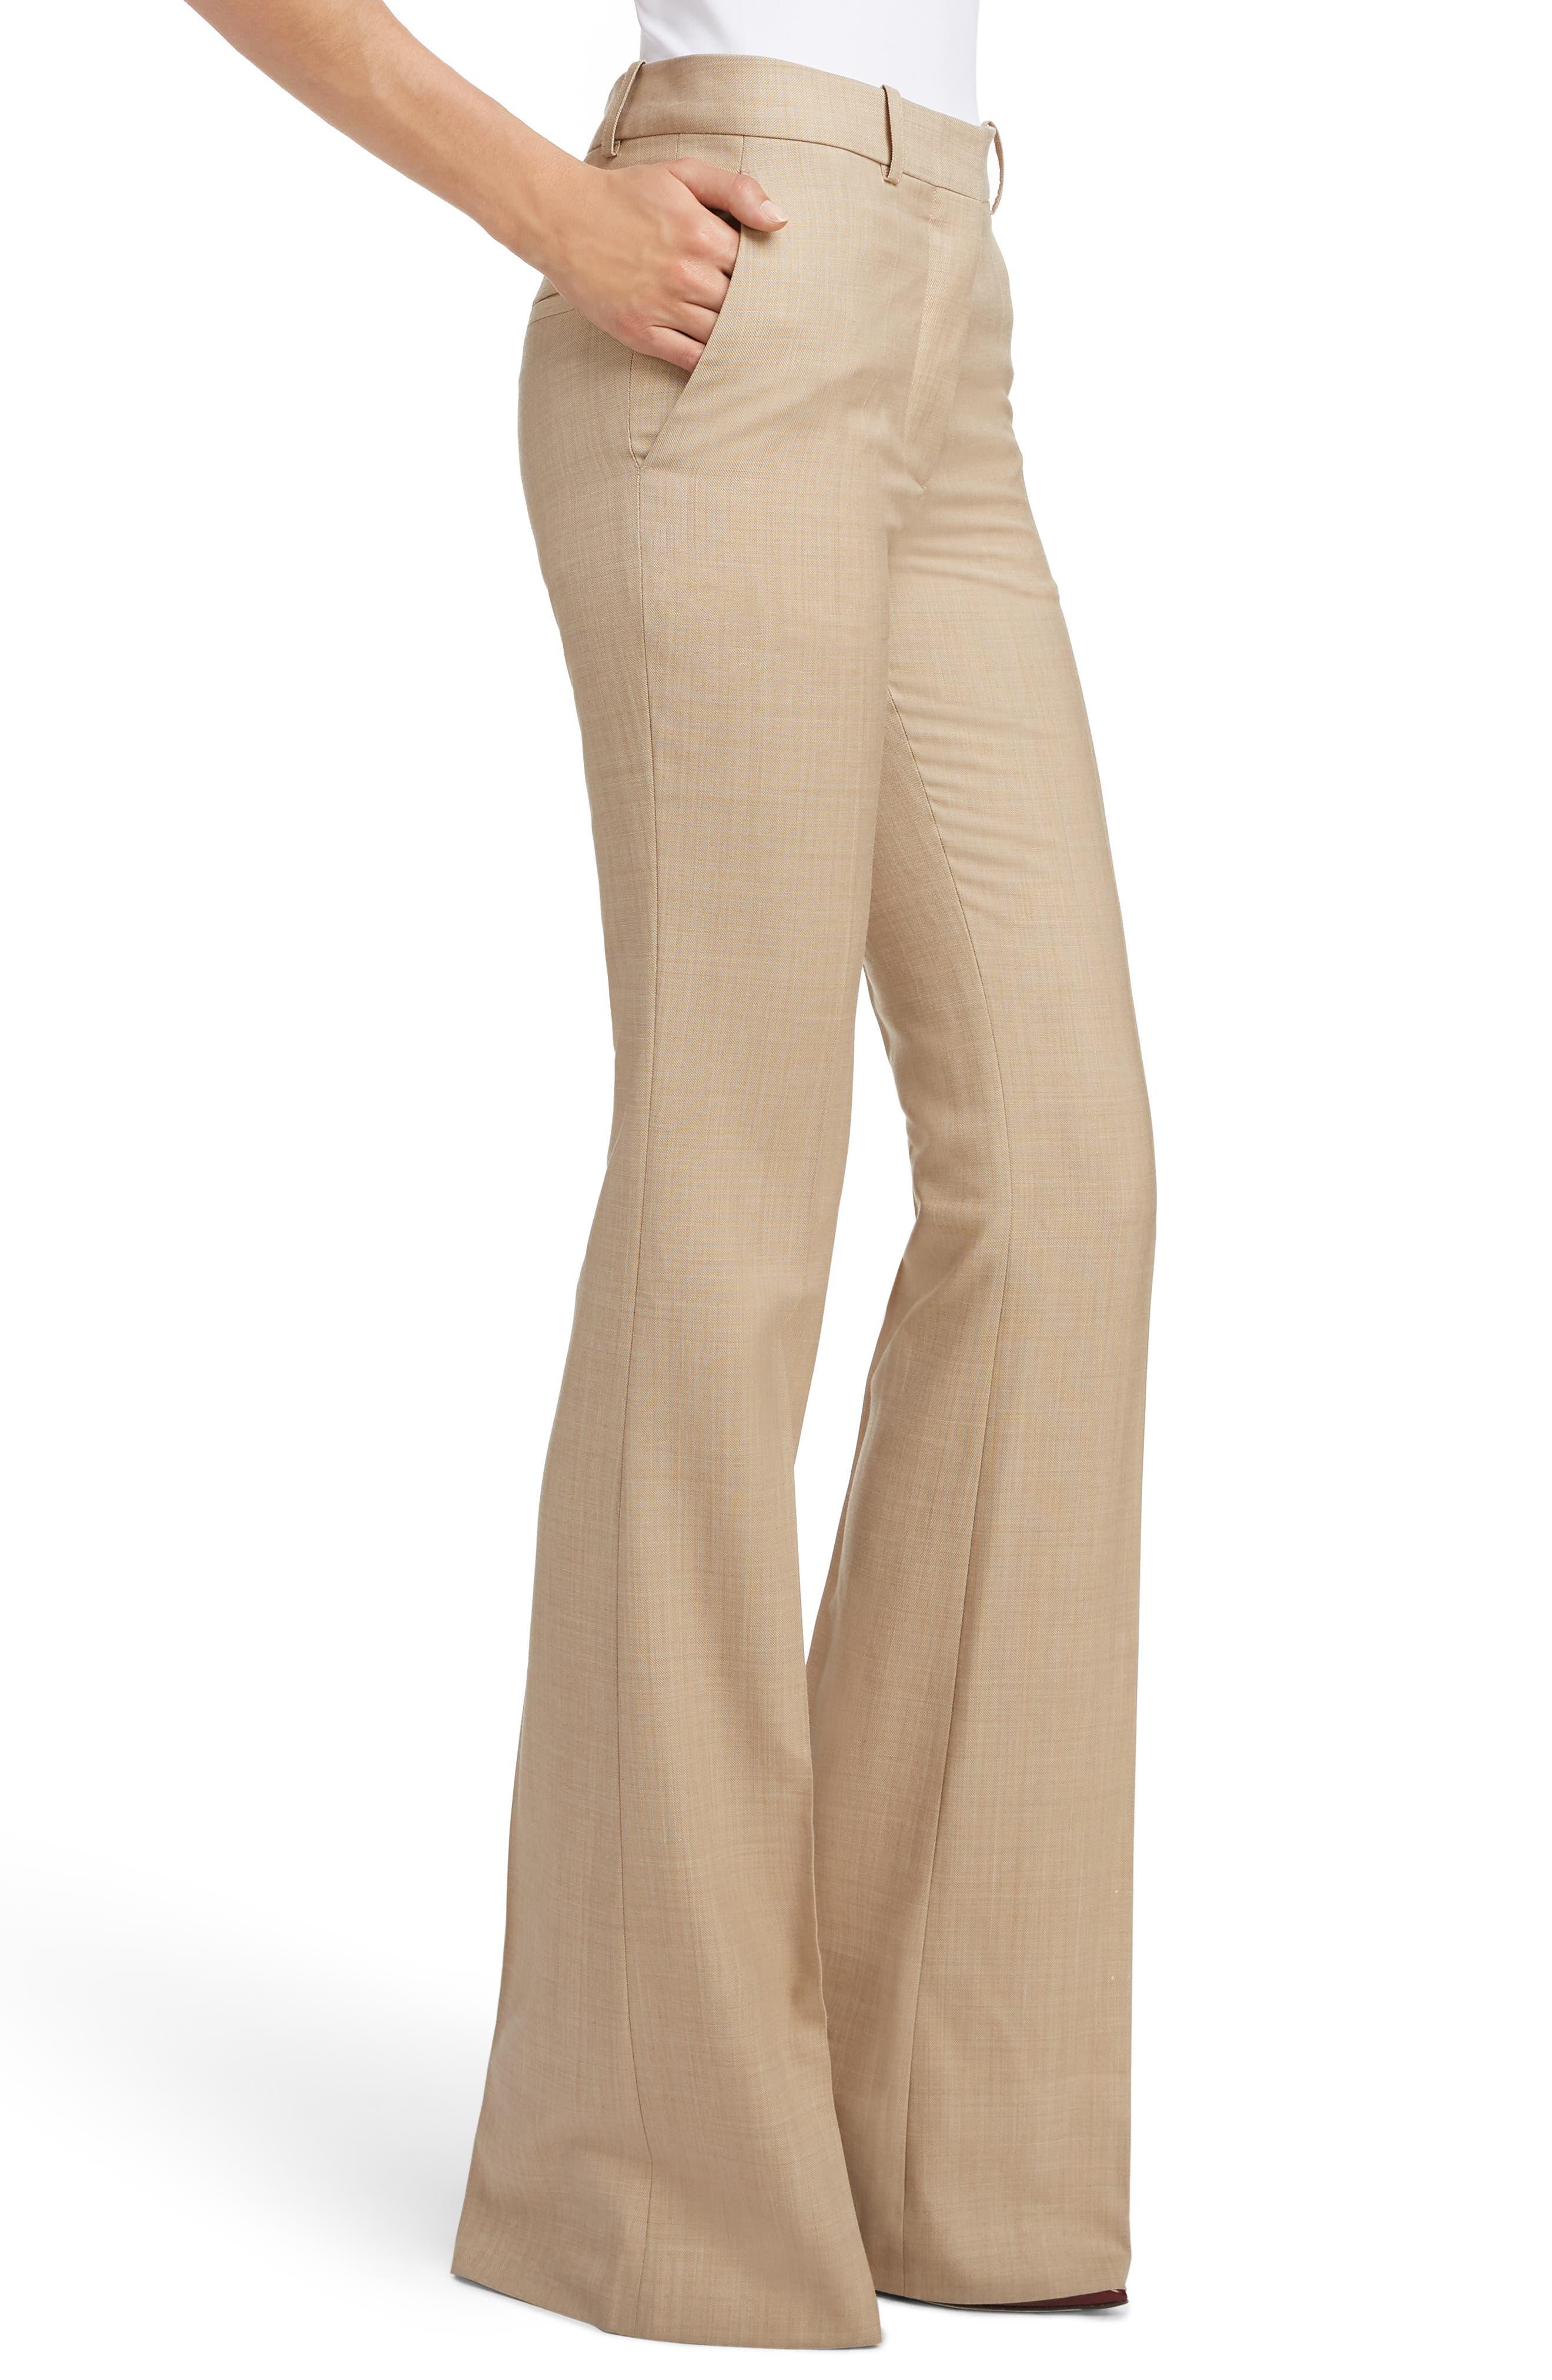 High Waist Flare Wool Pants,                             Alternate thumbnail 4, color,                             LIGHT BEIGE-WHITE